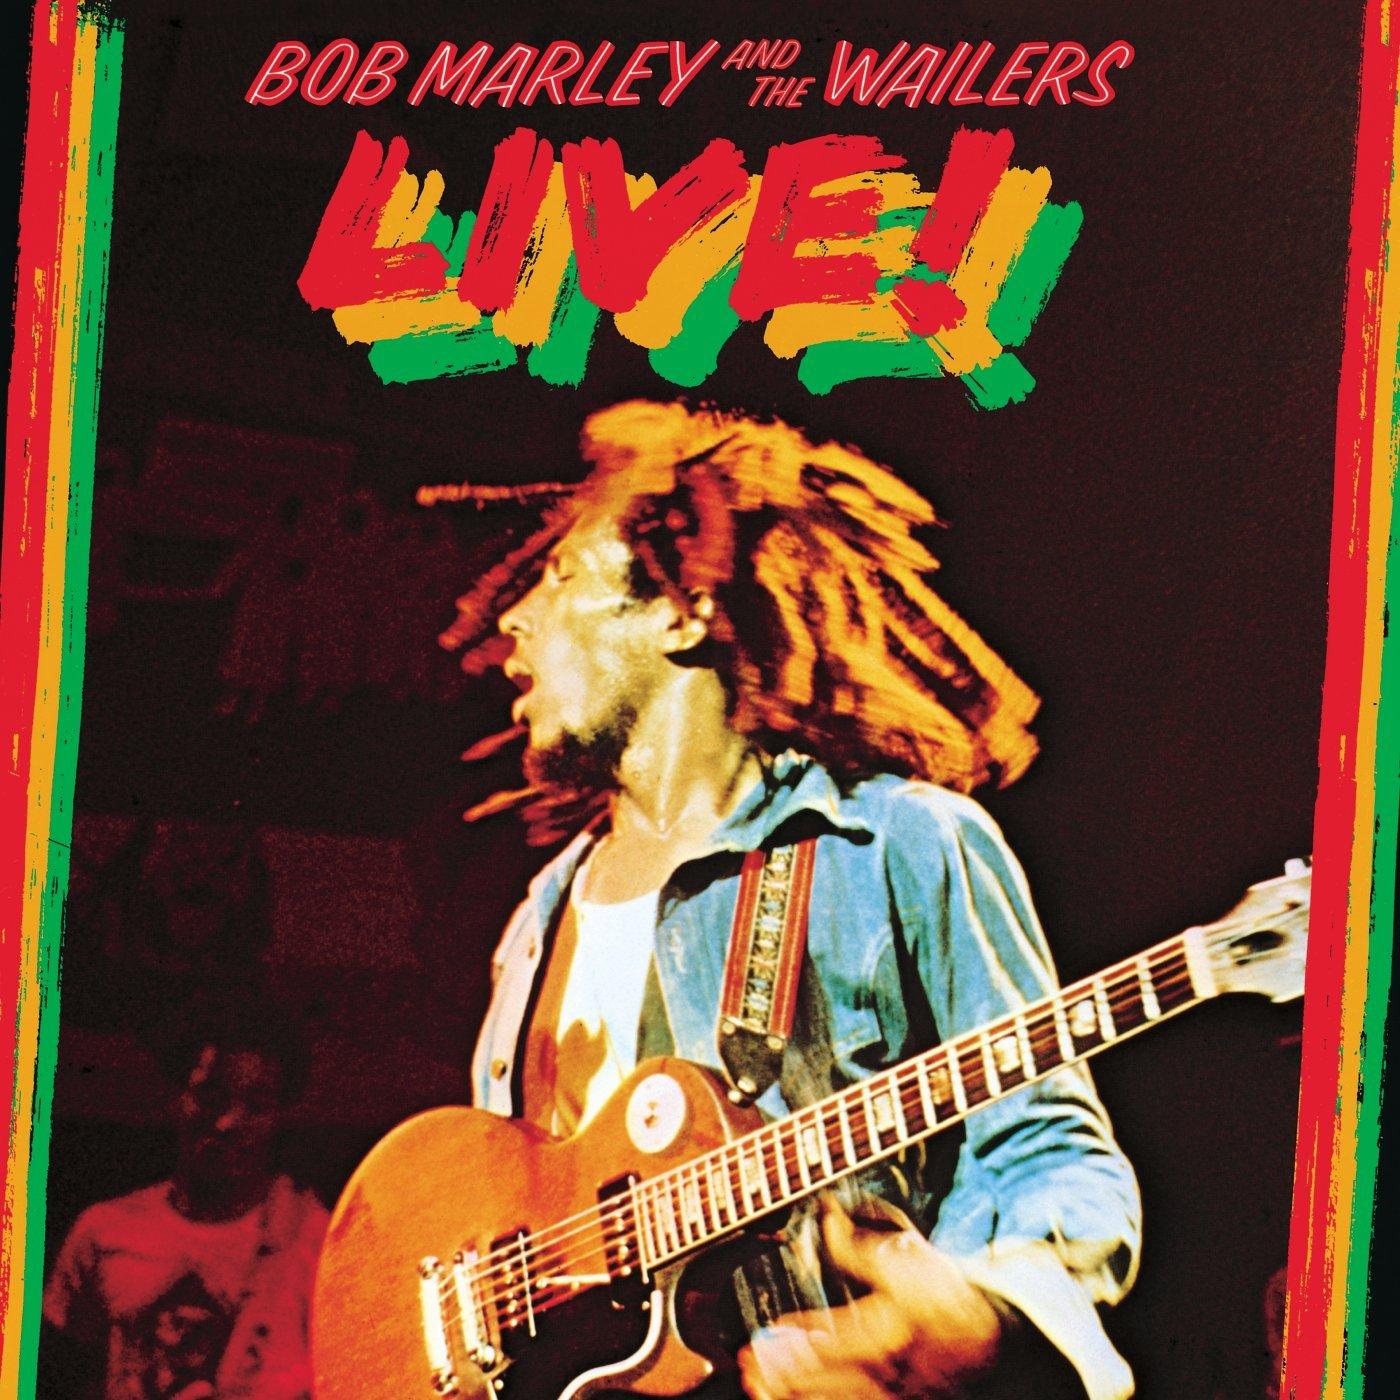 Bob Marley & The Wailers – Live! (1987) [FLAC]